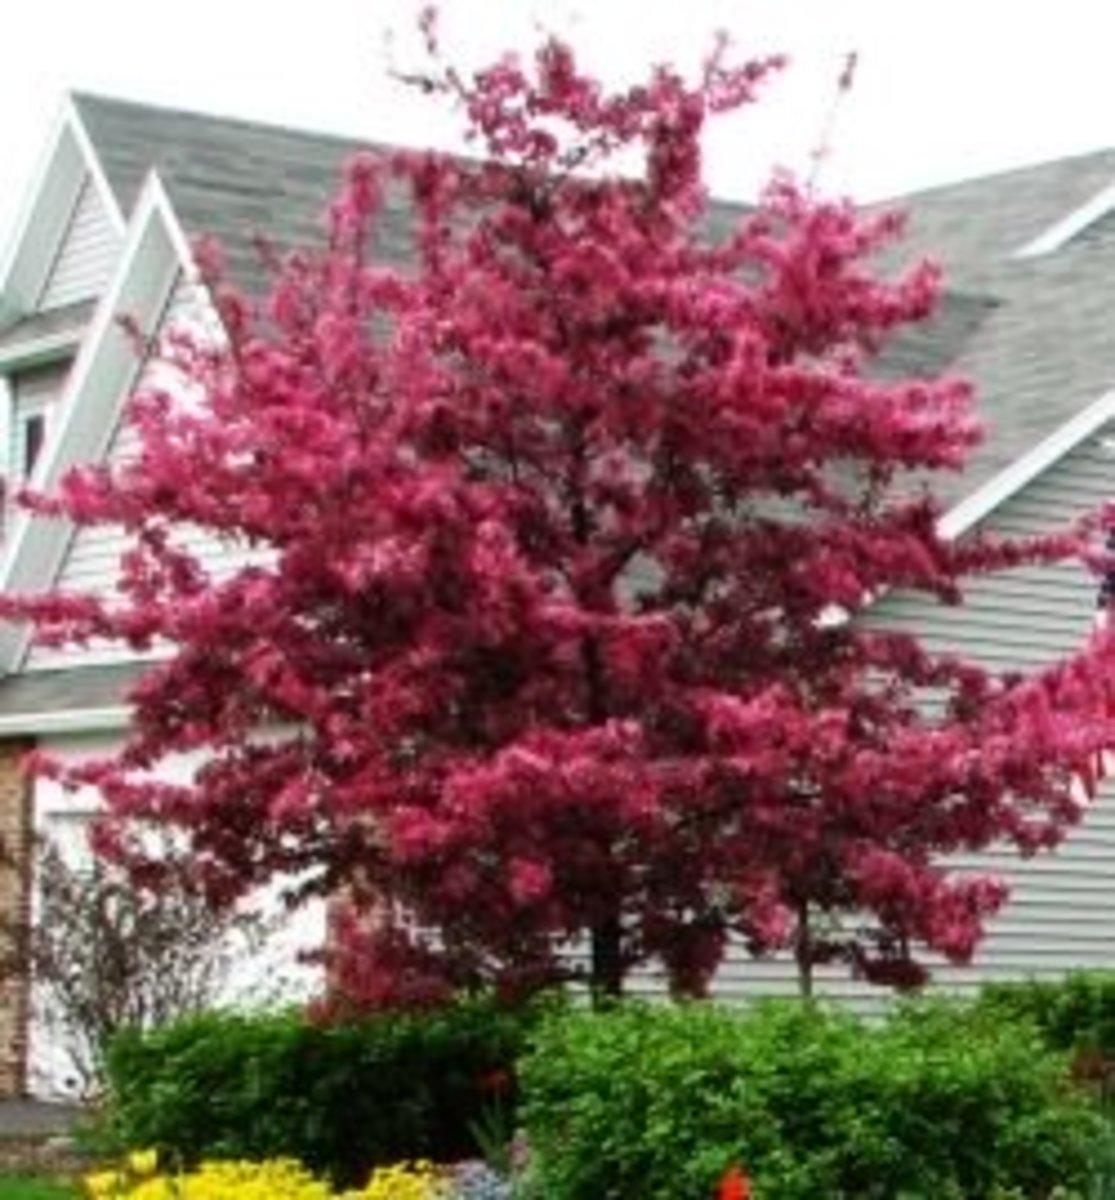 Flowering Crabapple Trees - Four Seasons of Beauty